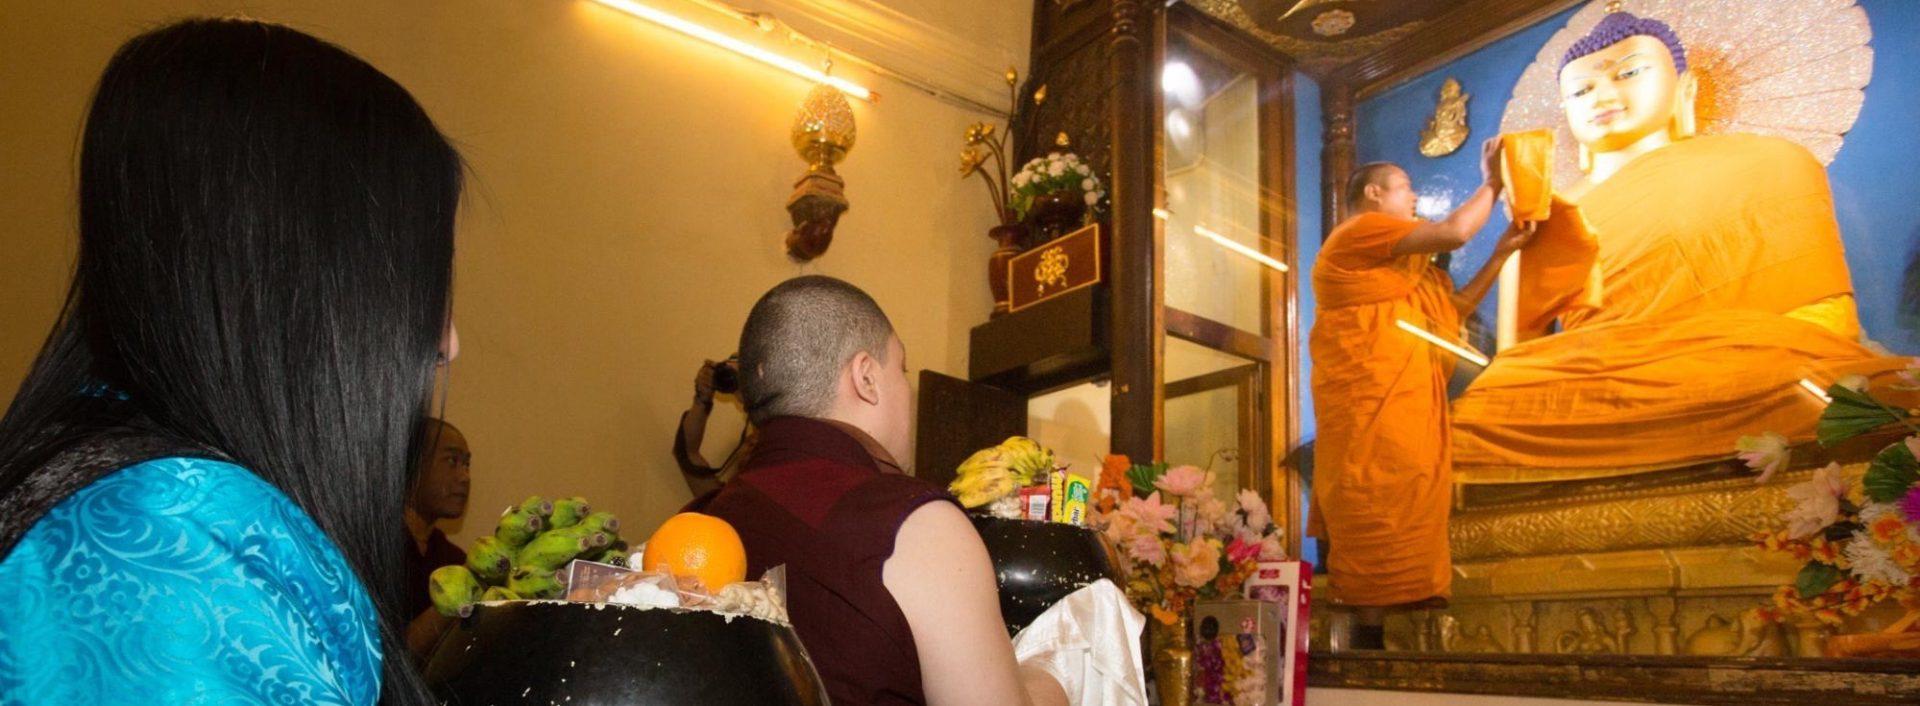 Thaye Dorje, His Holiness the 17th Gyalwa Karmapa, and his wife Sangyumla Rinchen Yangzom making offerings at Bodh Gaya in 2017